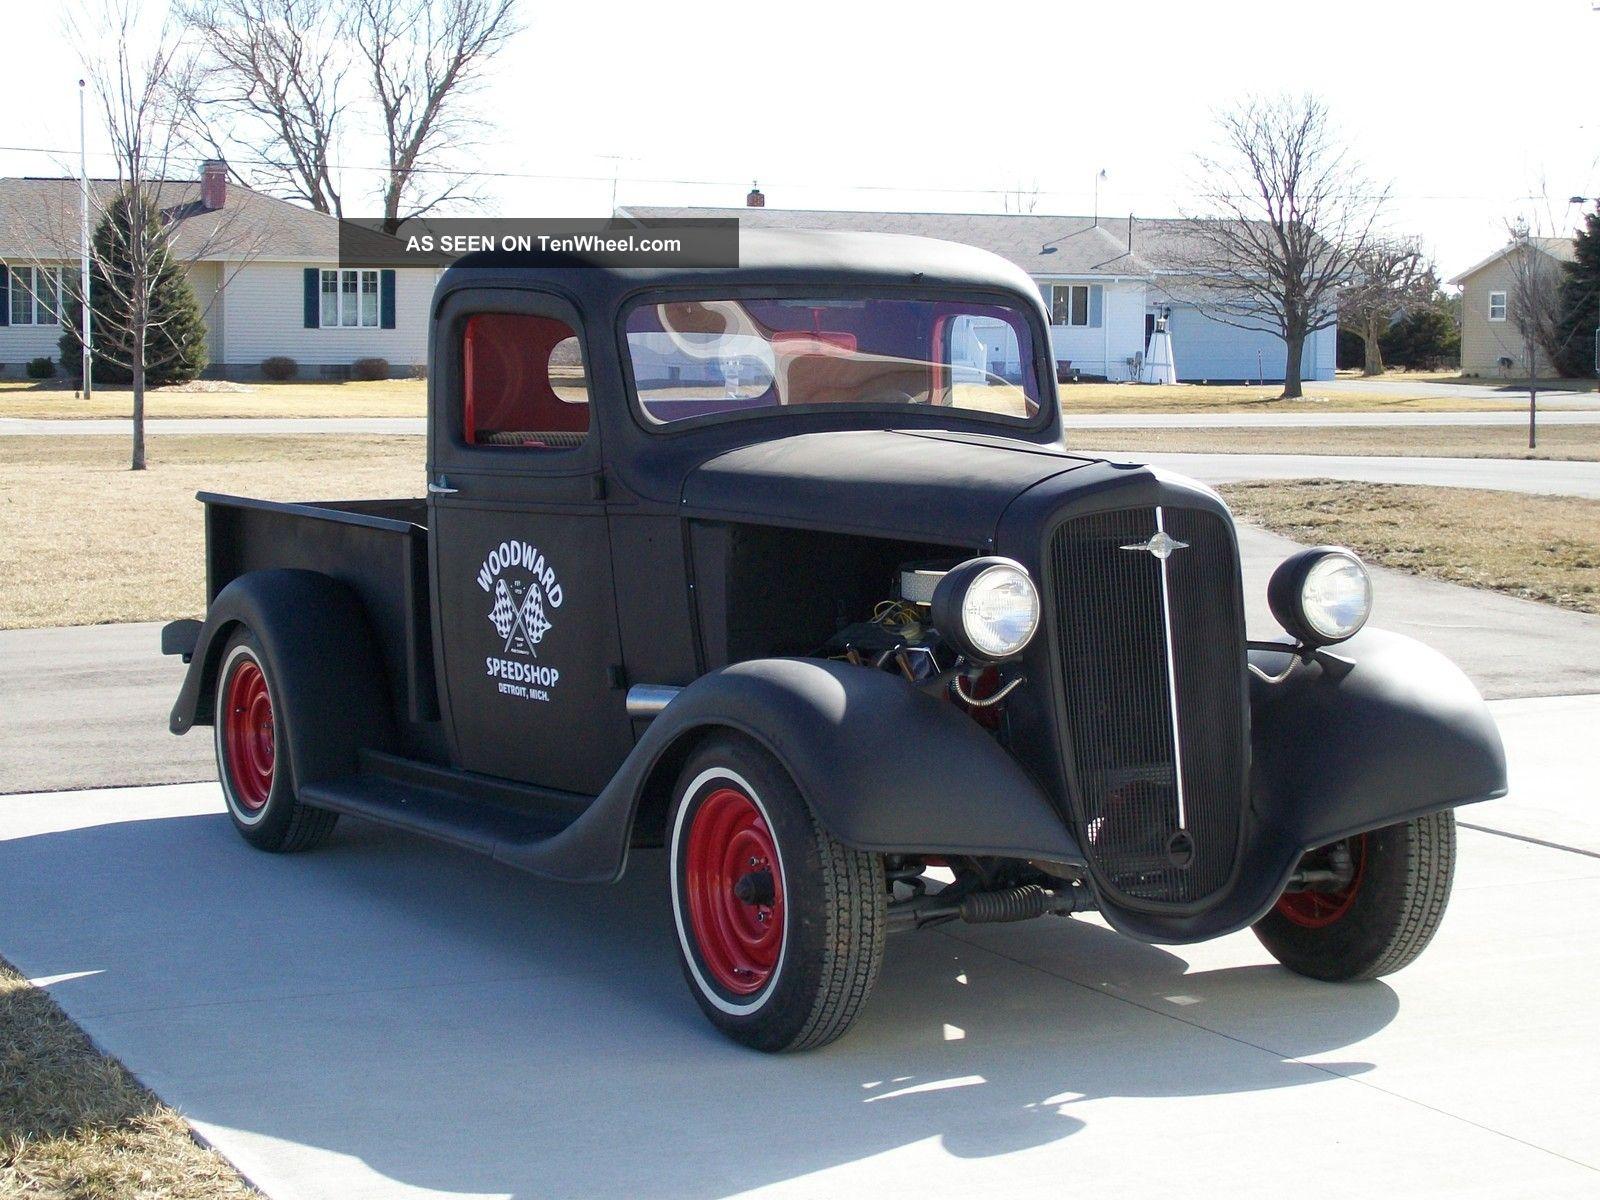 37 ford truck for sale html autos weblog RV Motorhomes Diesel old diesel pusher motorhomes for sale